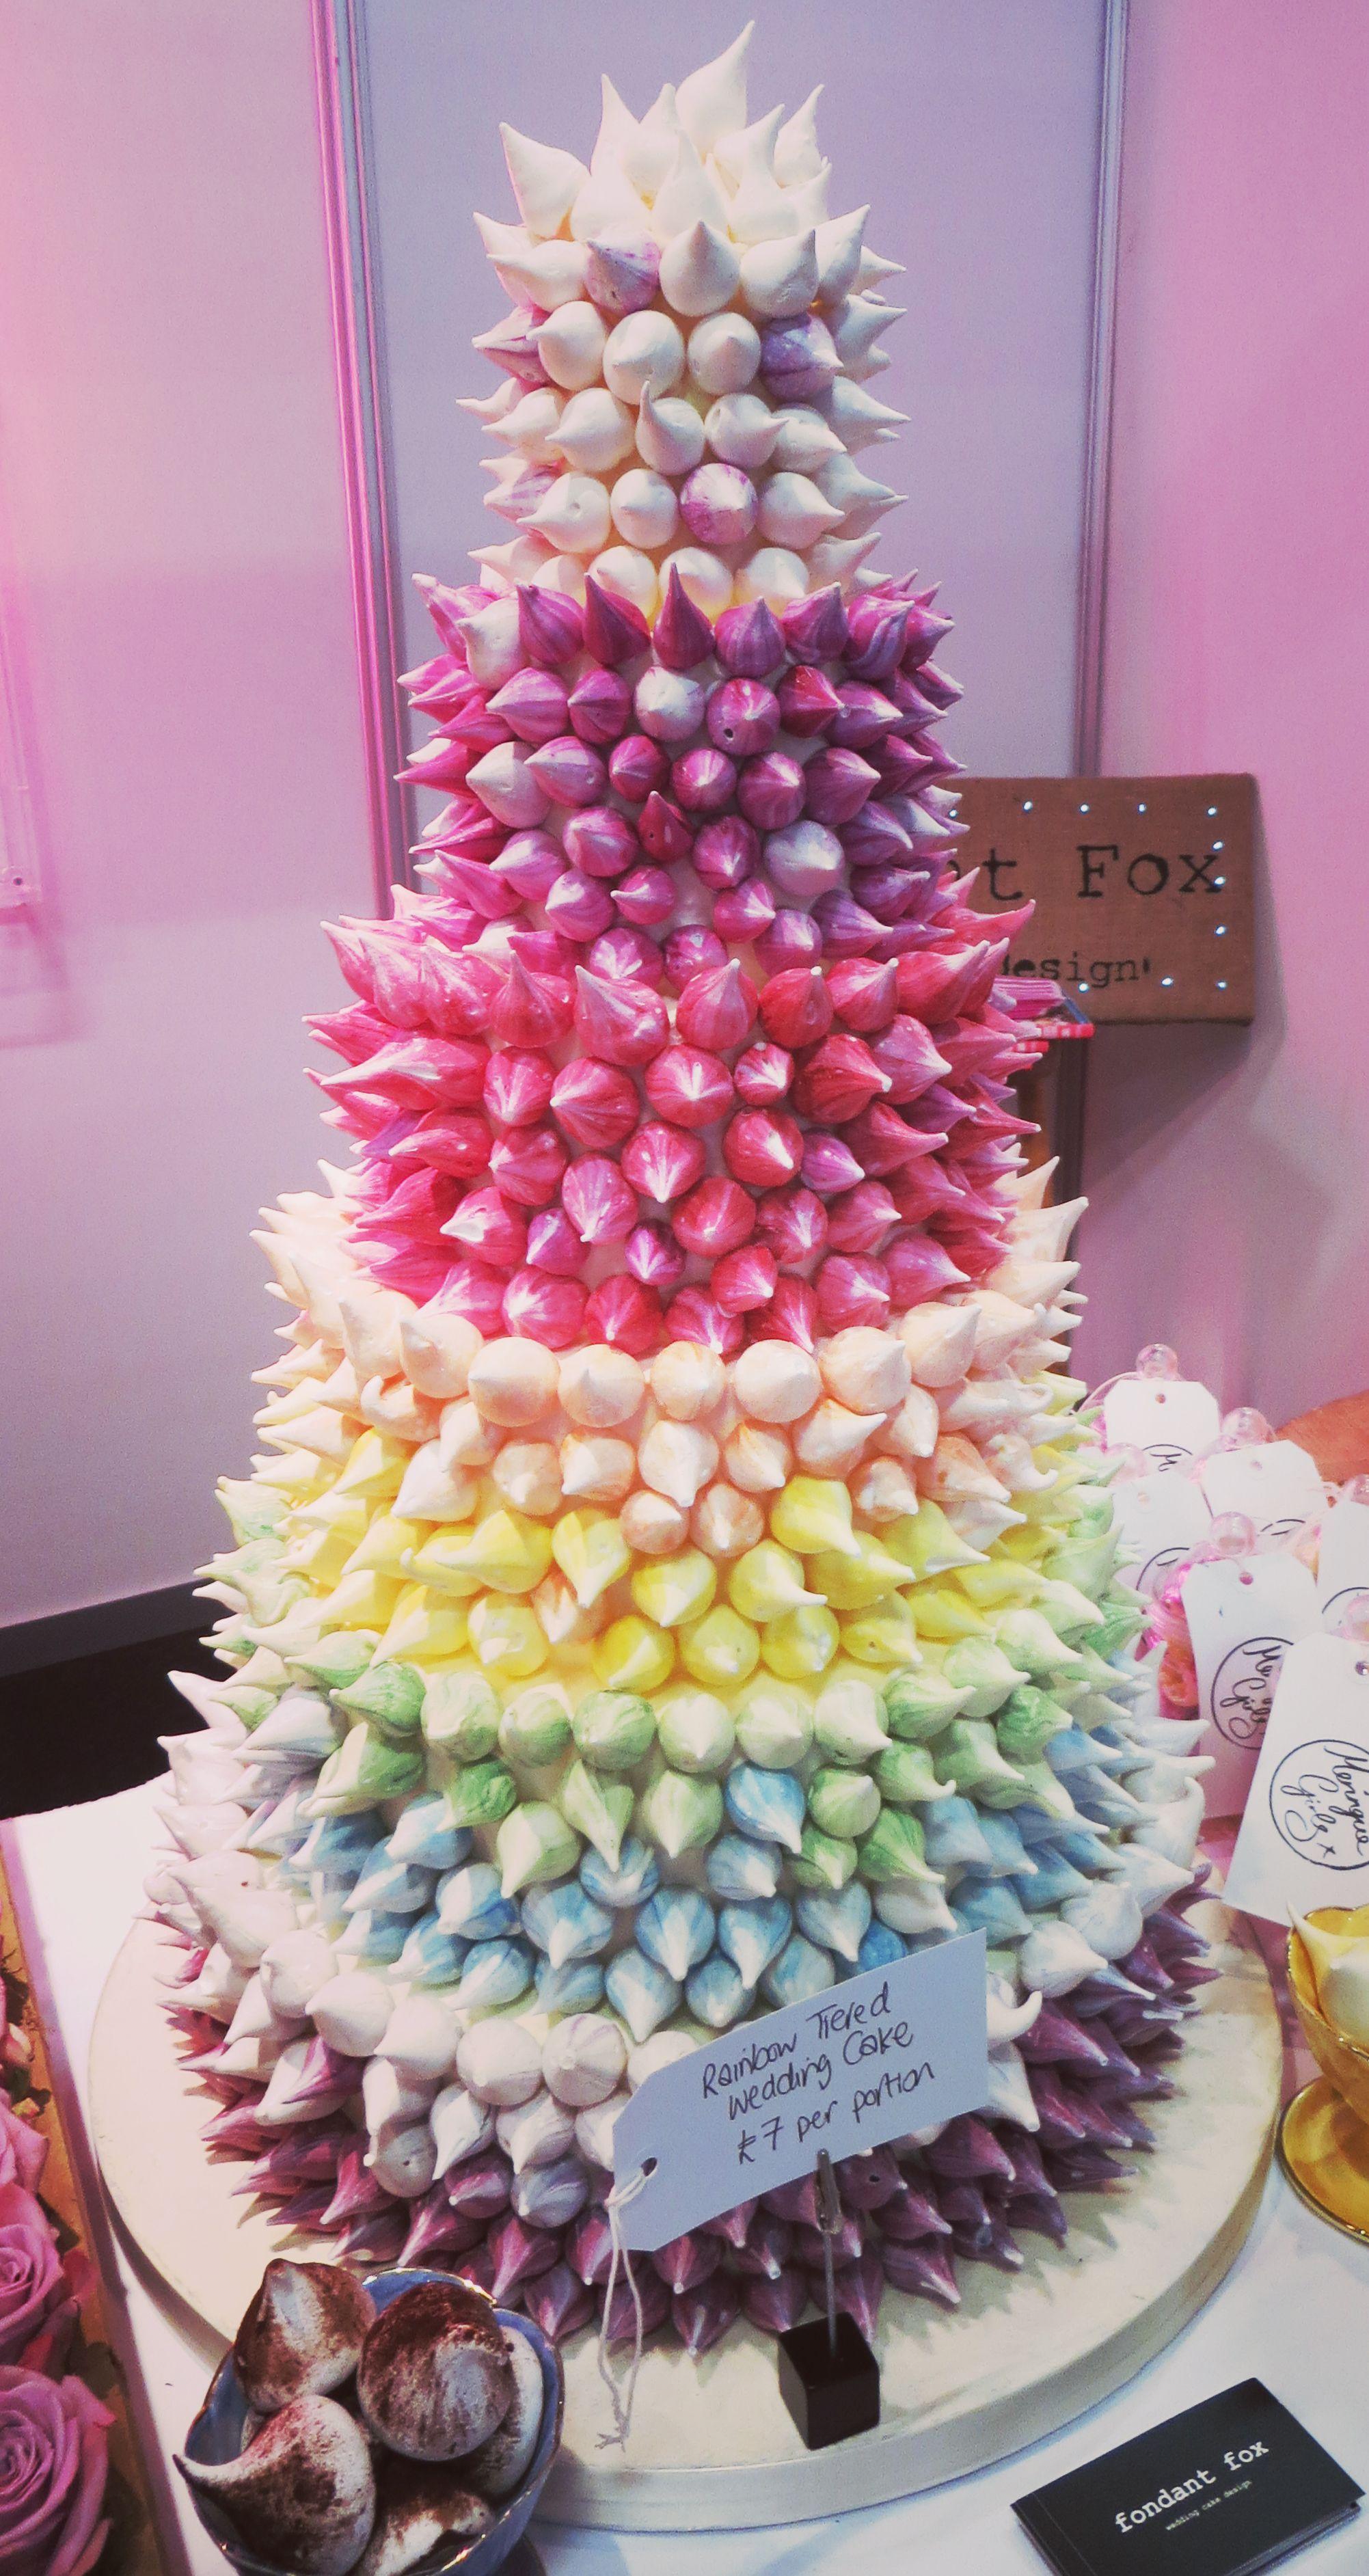 Rainbow coloured meringue 6 tier wedding cake by Fondant Fox Cake